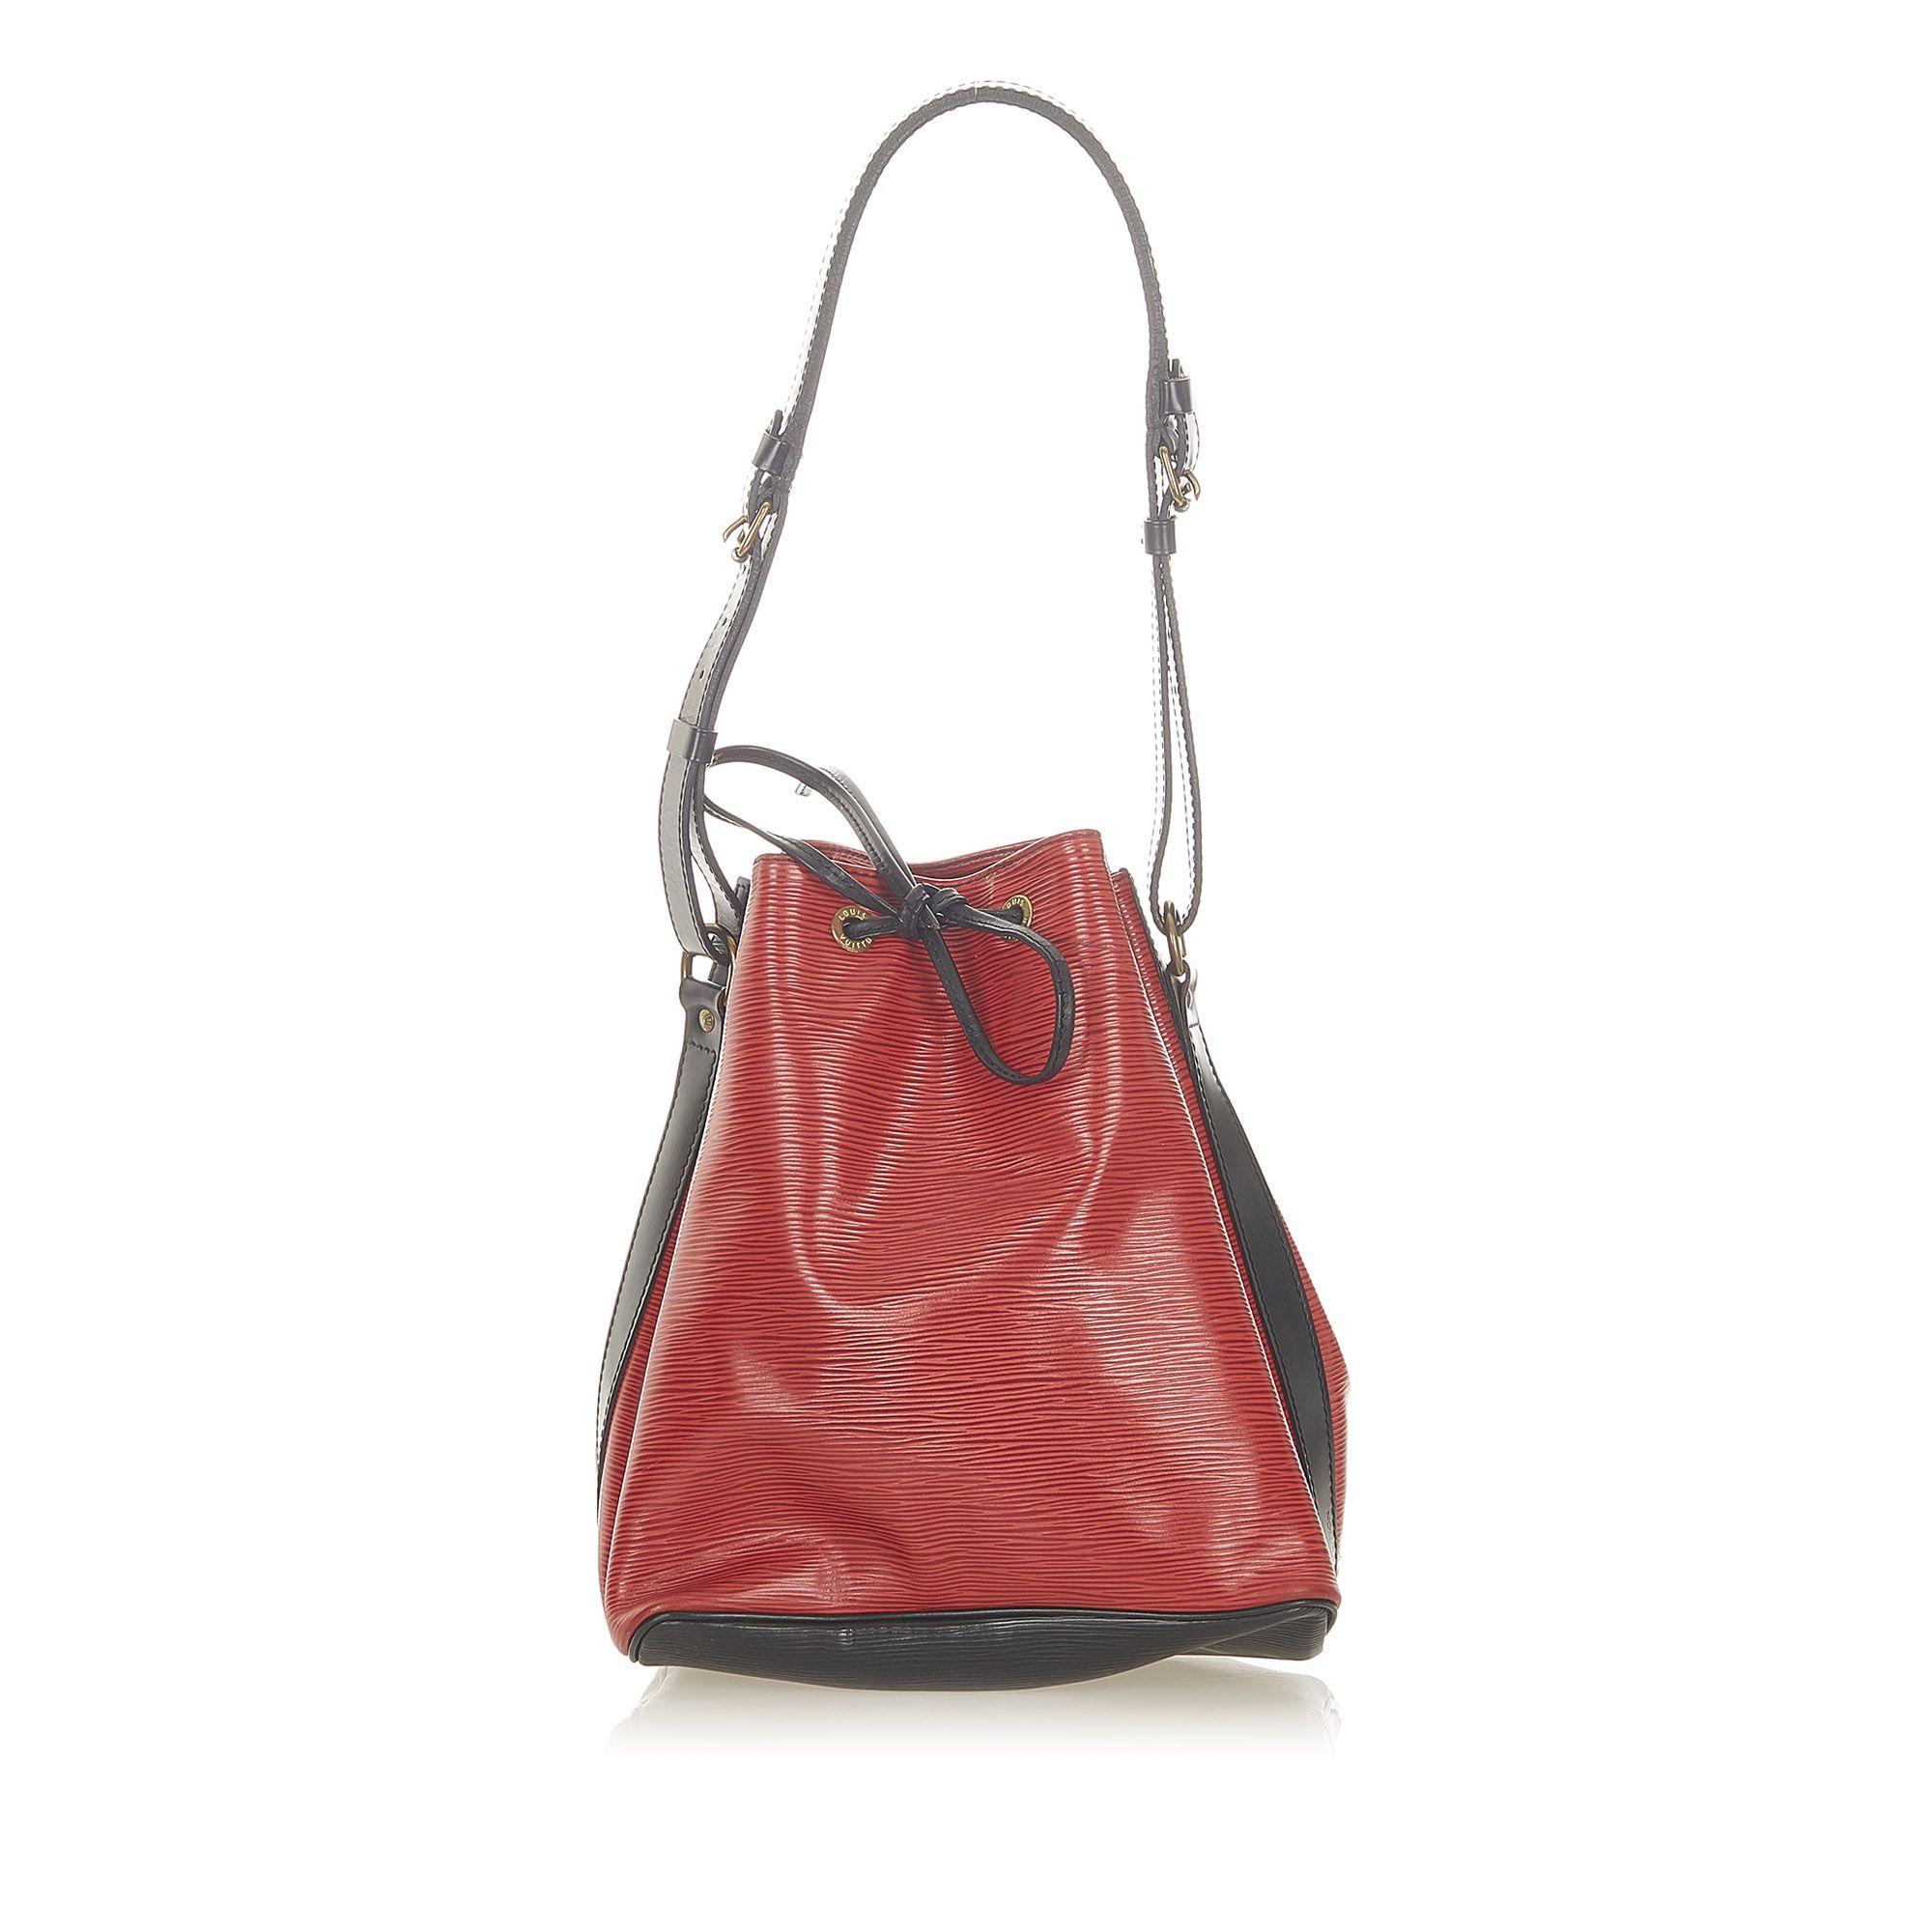 Vintage Louis Vuitton Epi Neonoe Red